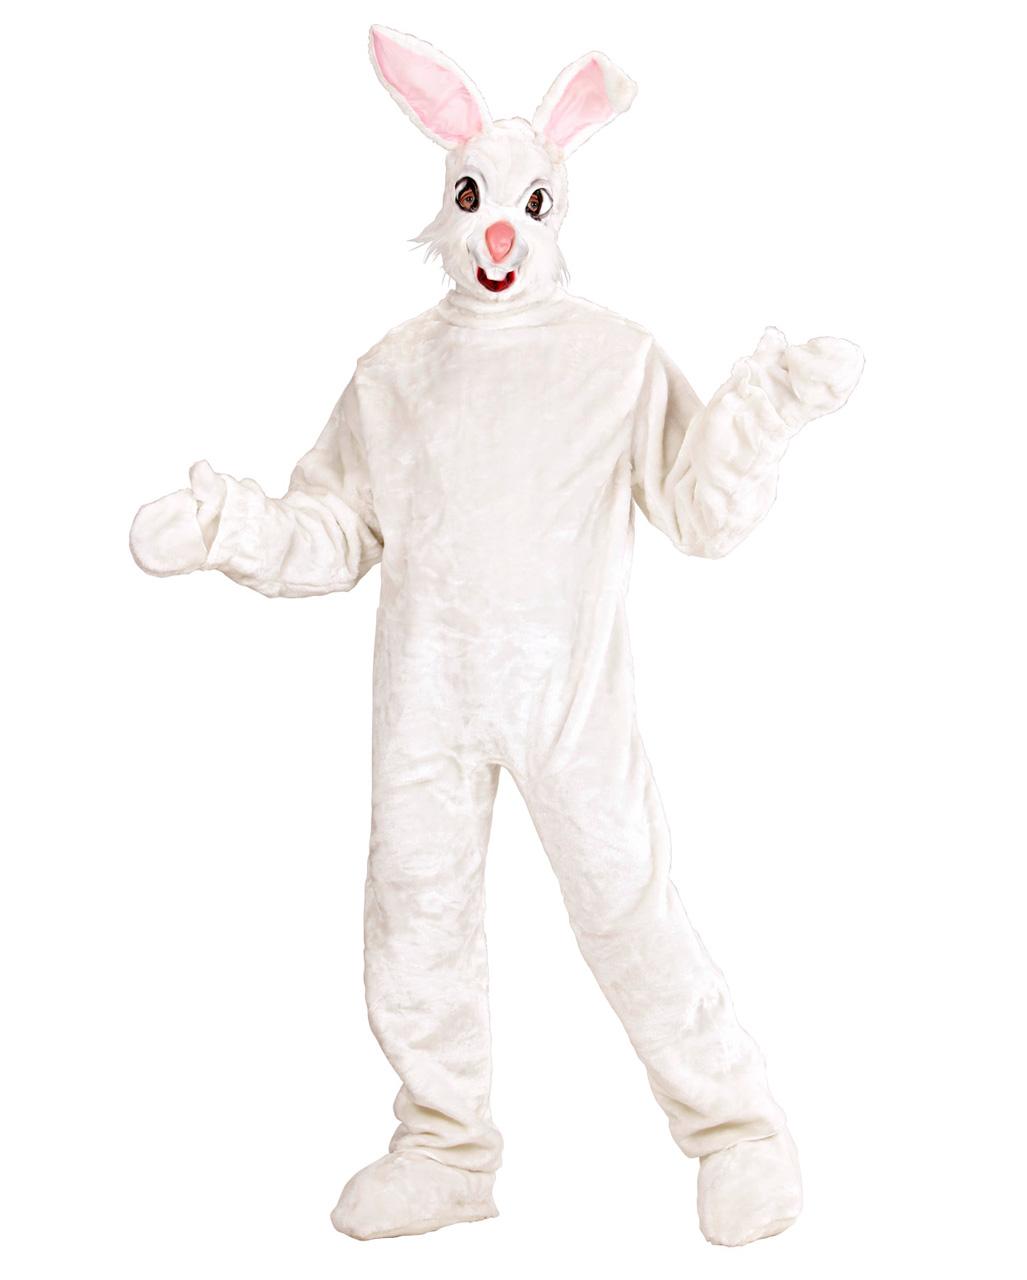 Plush Bunny Costume White Plush Bunny Costume White ...  sc 1 st  Horror-Shop.com & Plush Bunny Costume White | Rabbit made of plush costume | horror ...